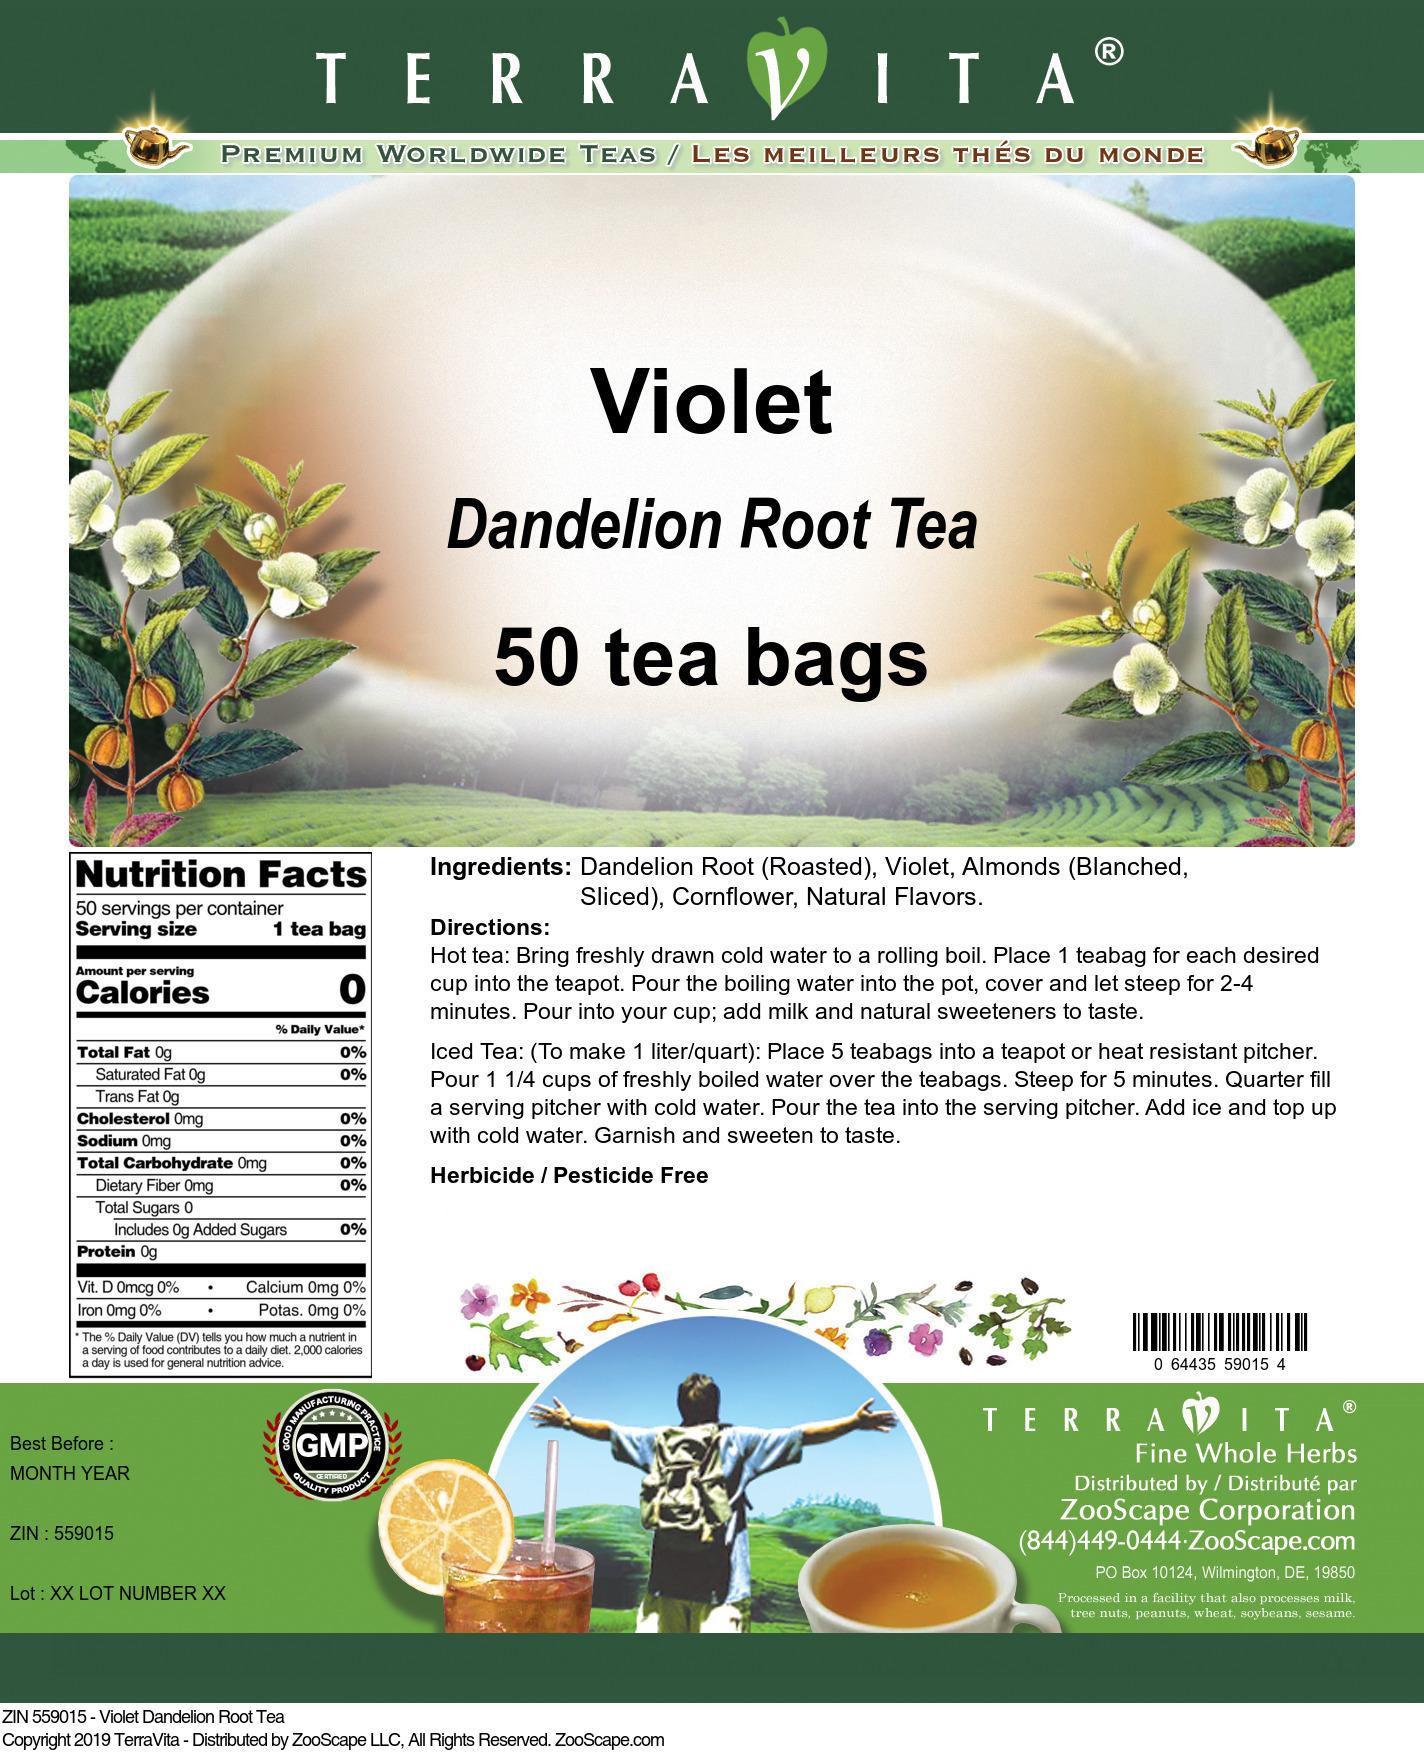 Violet Dandelion Root Tea